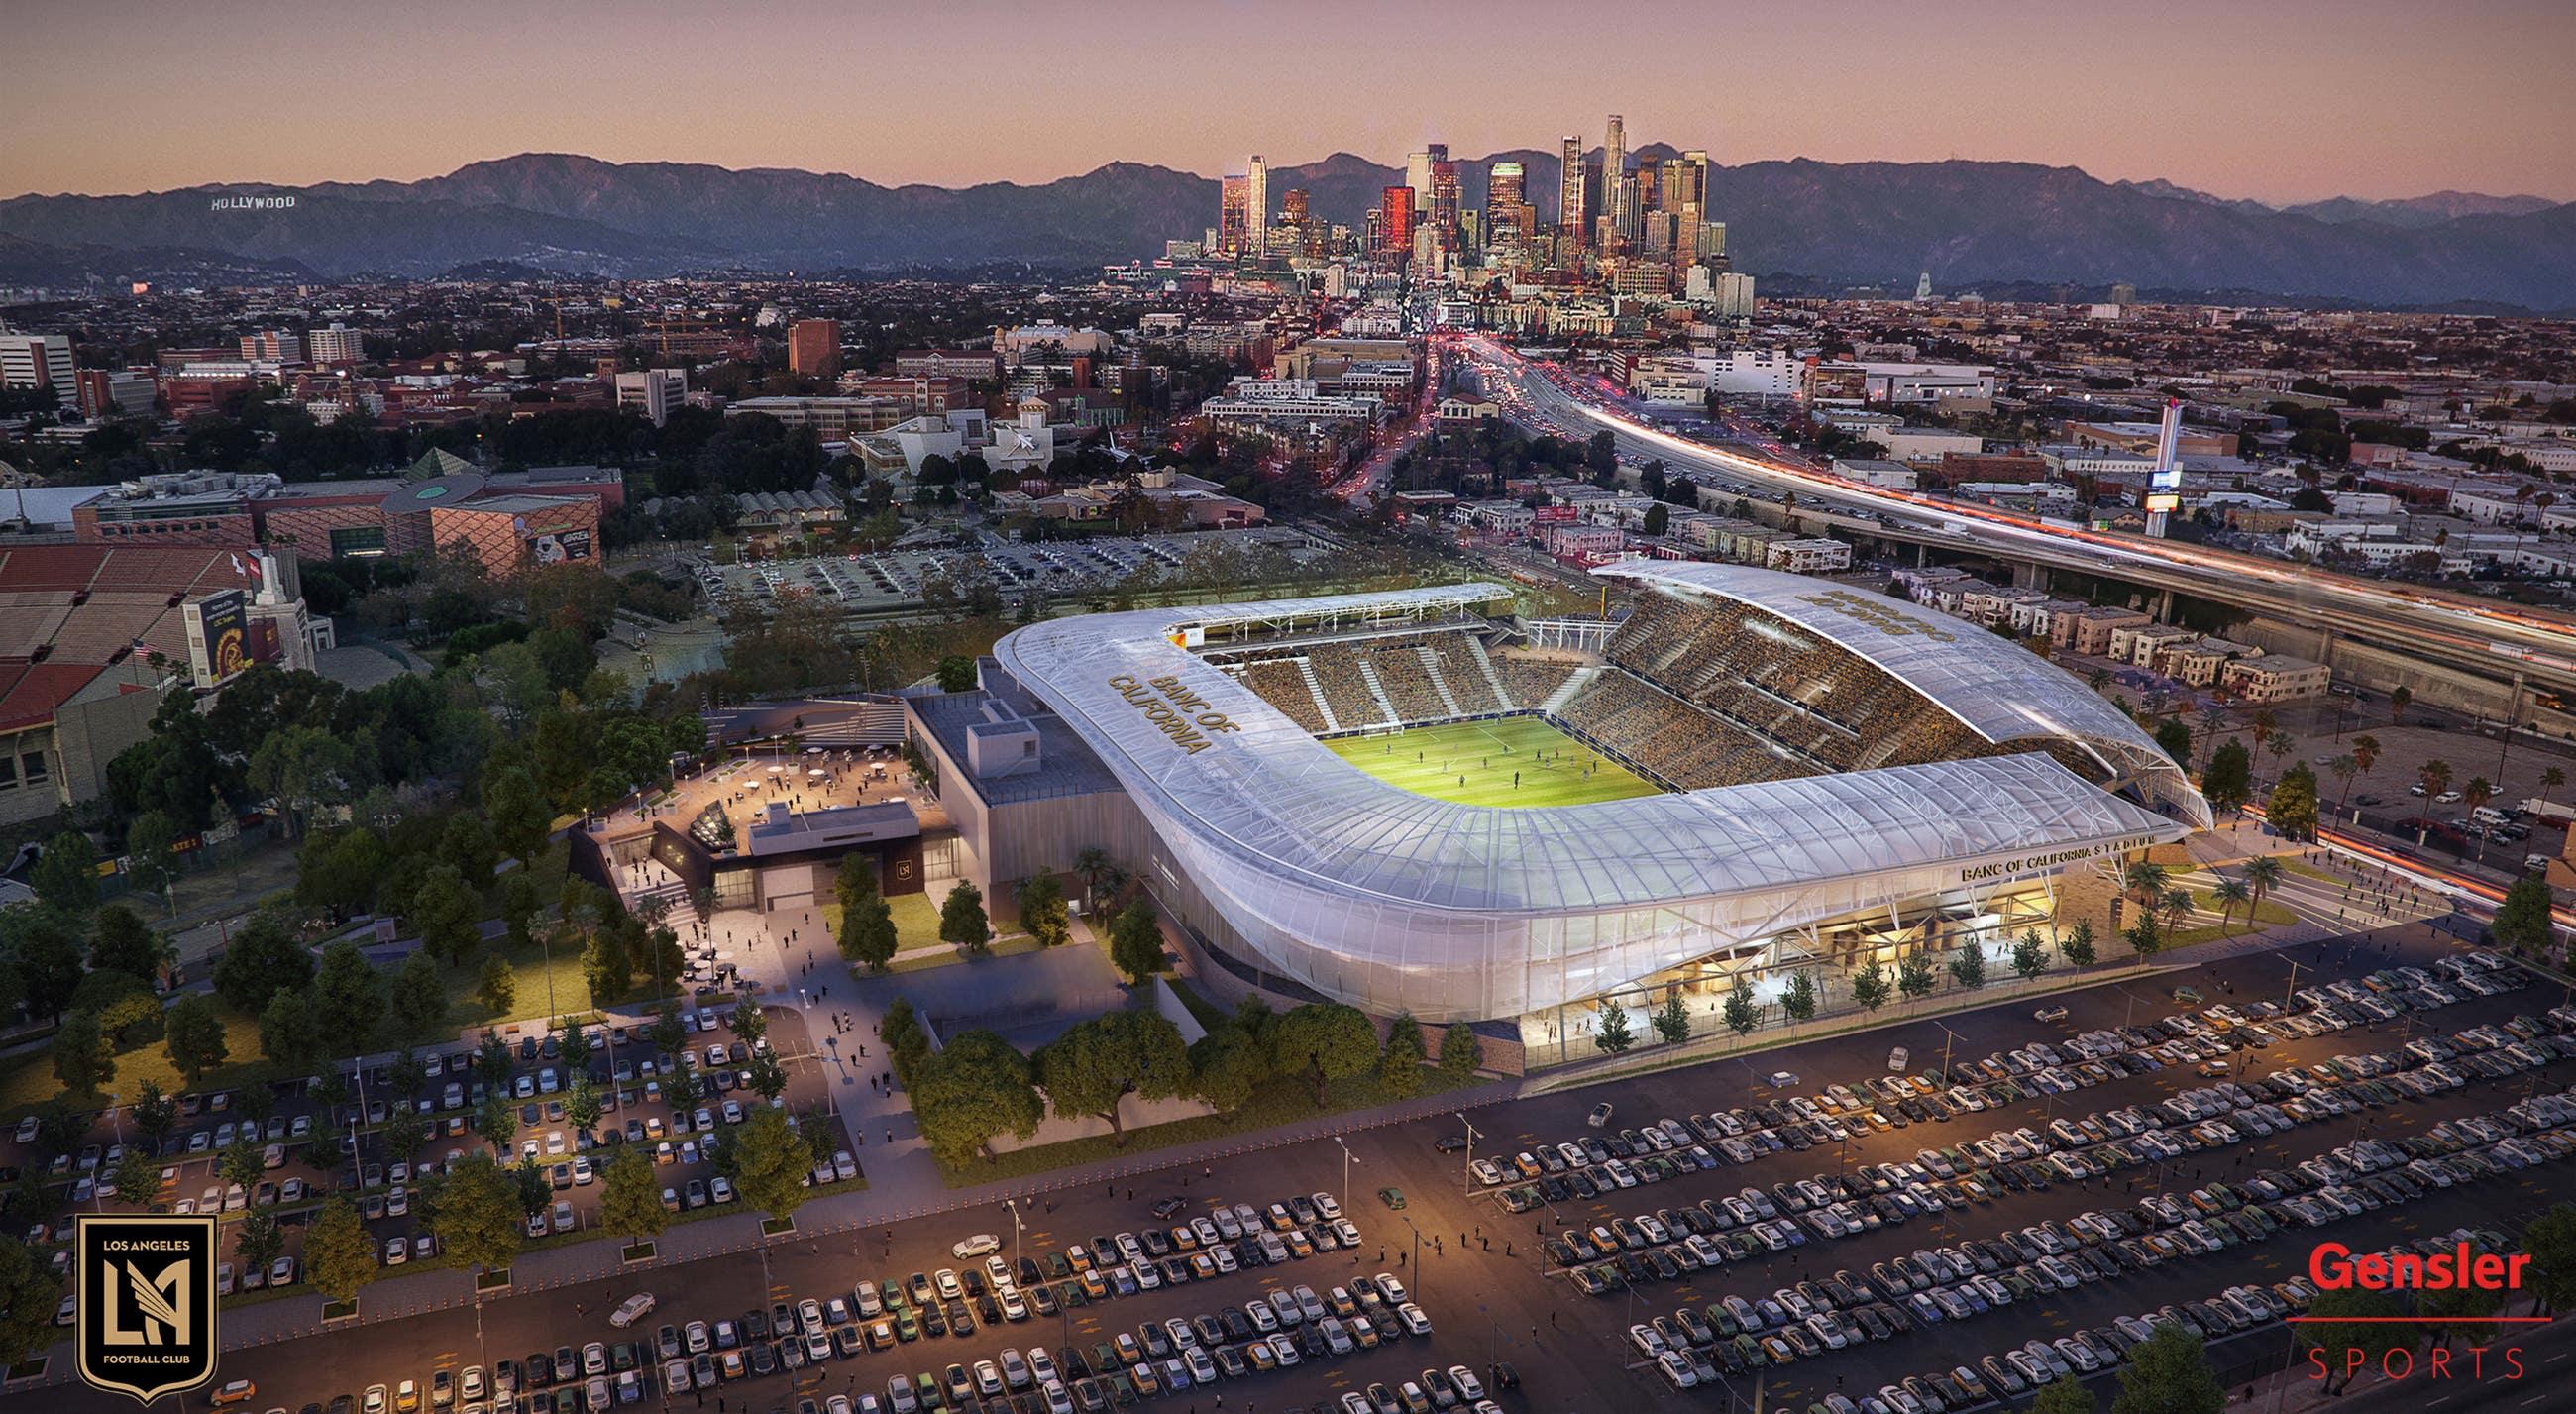 Los Angeles Football Club/Banc of California Stadium - los angeles event spaces